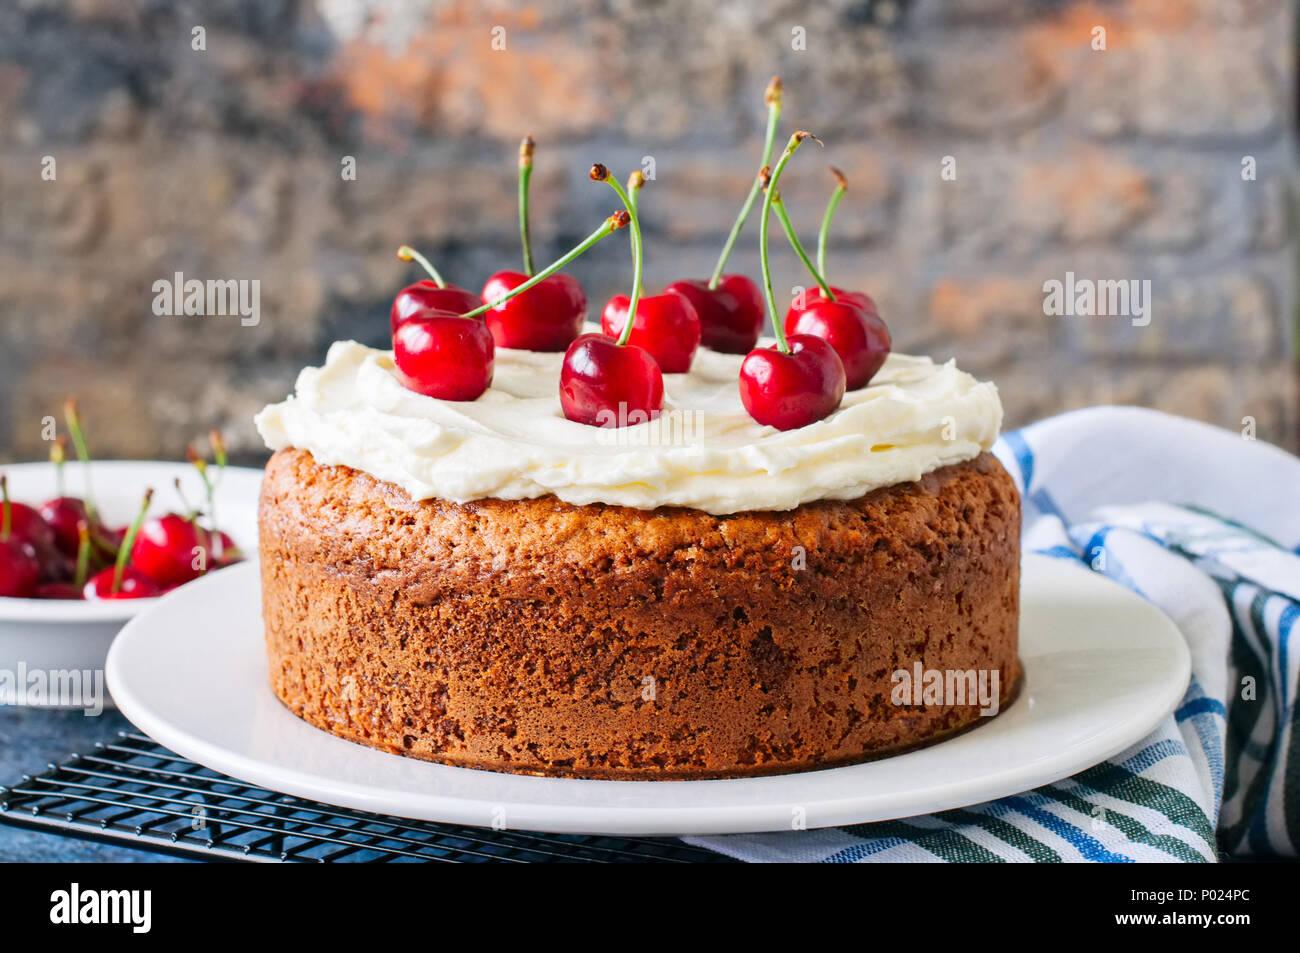 Cream Cake With Sour Cherries Stockfotos Cream Cake With Sour